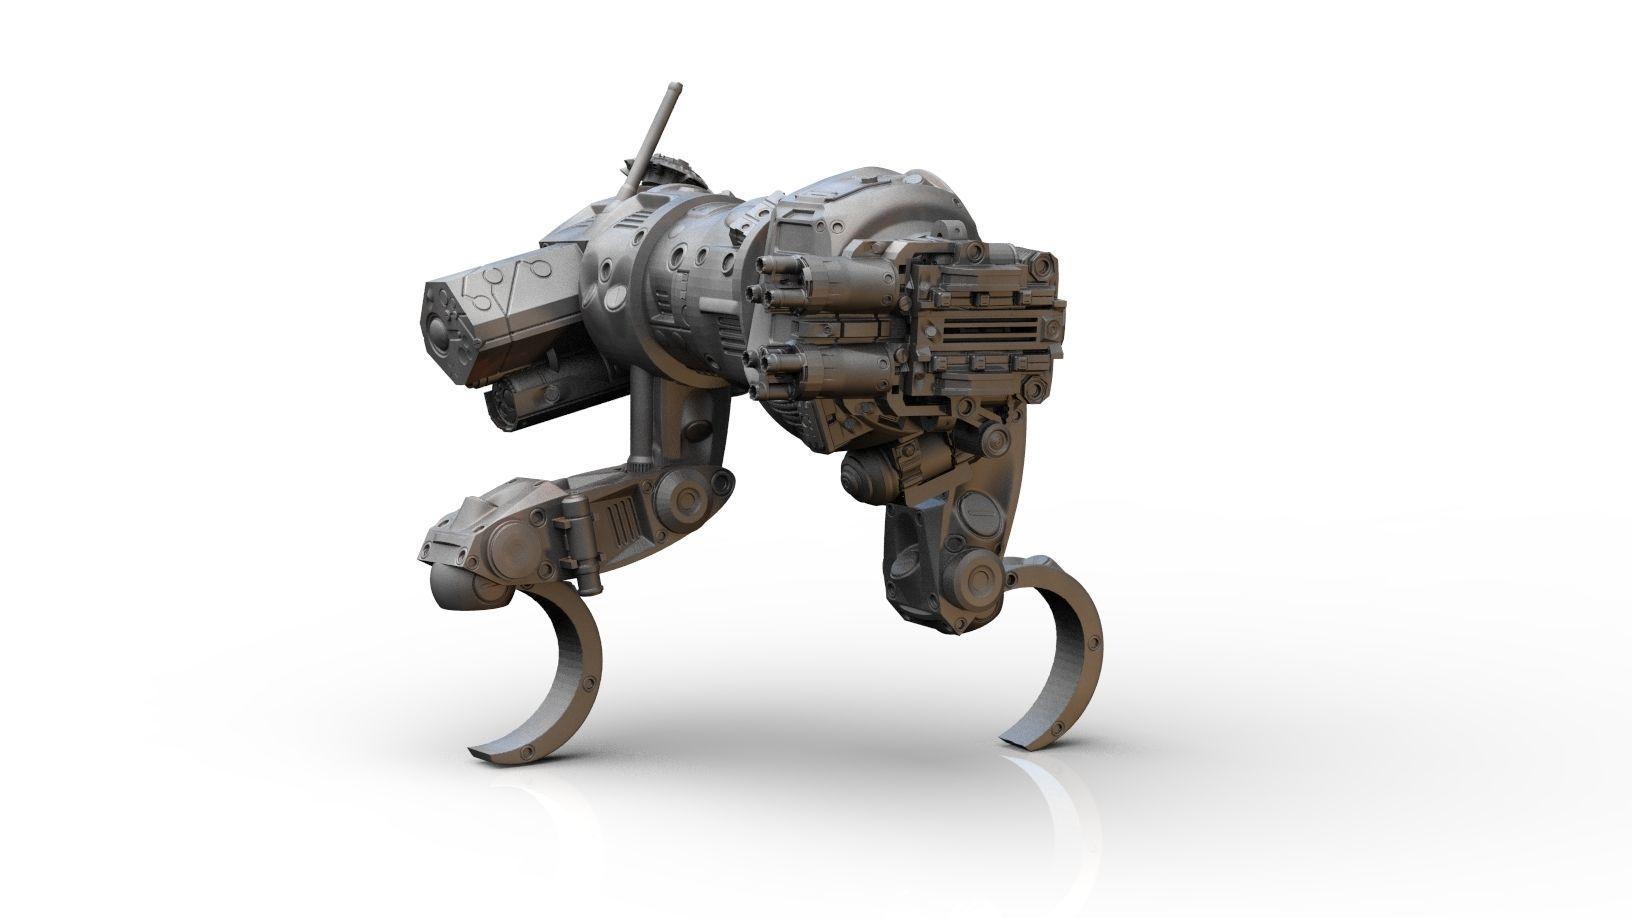 Mech- Sabueso All terrain military mech vehicle